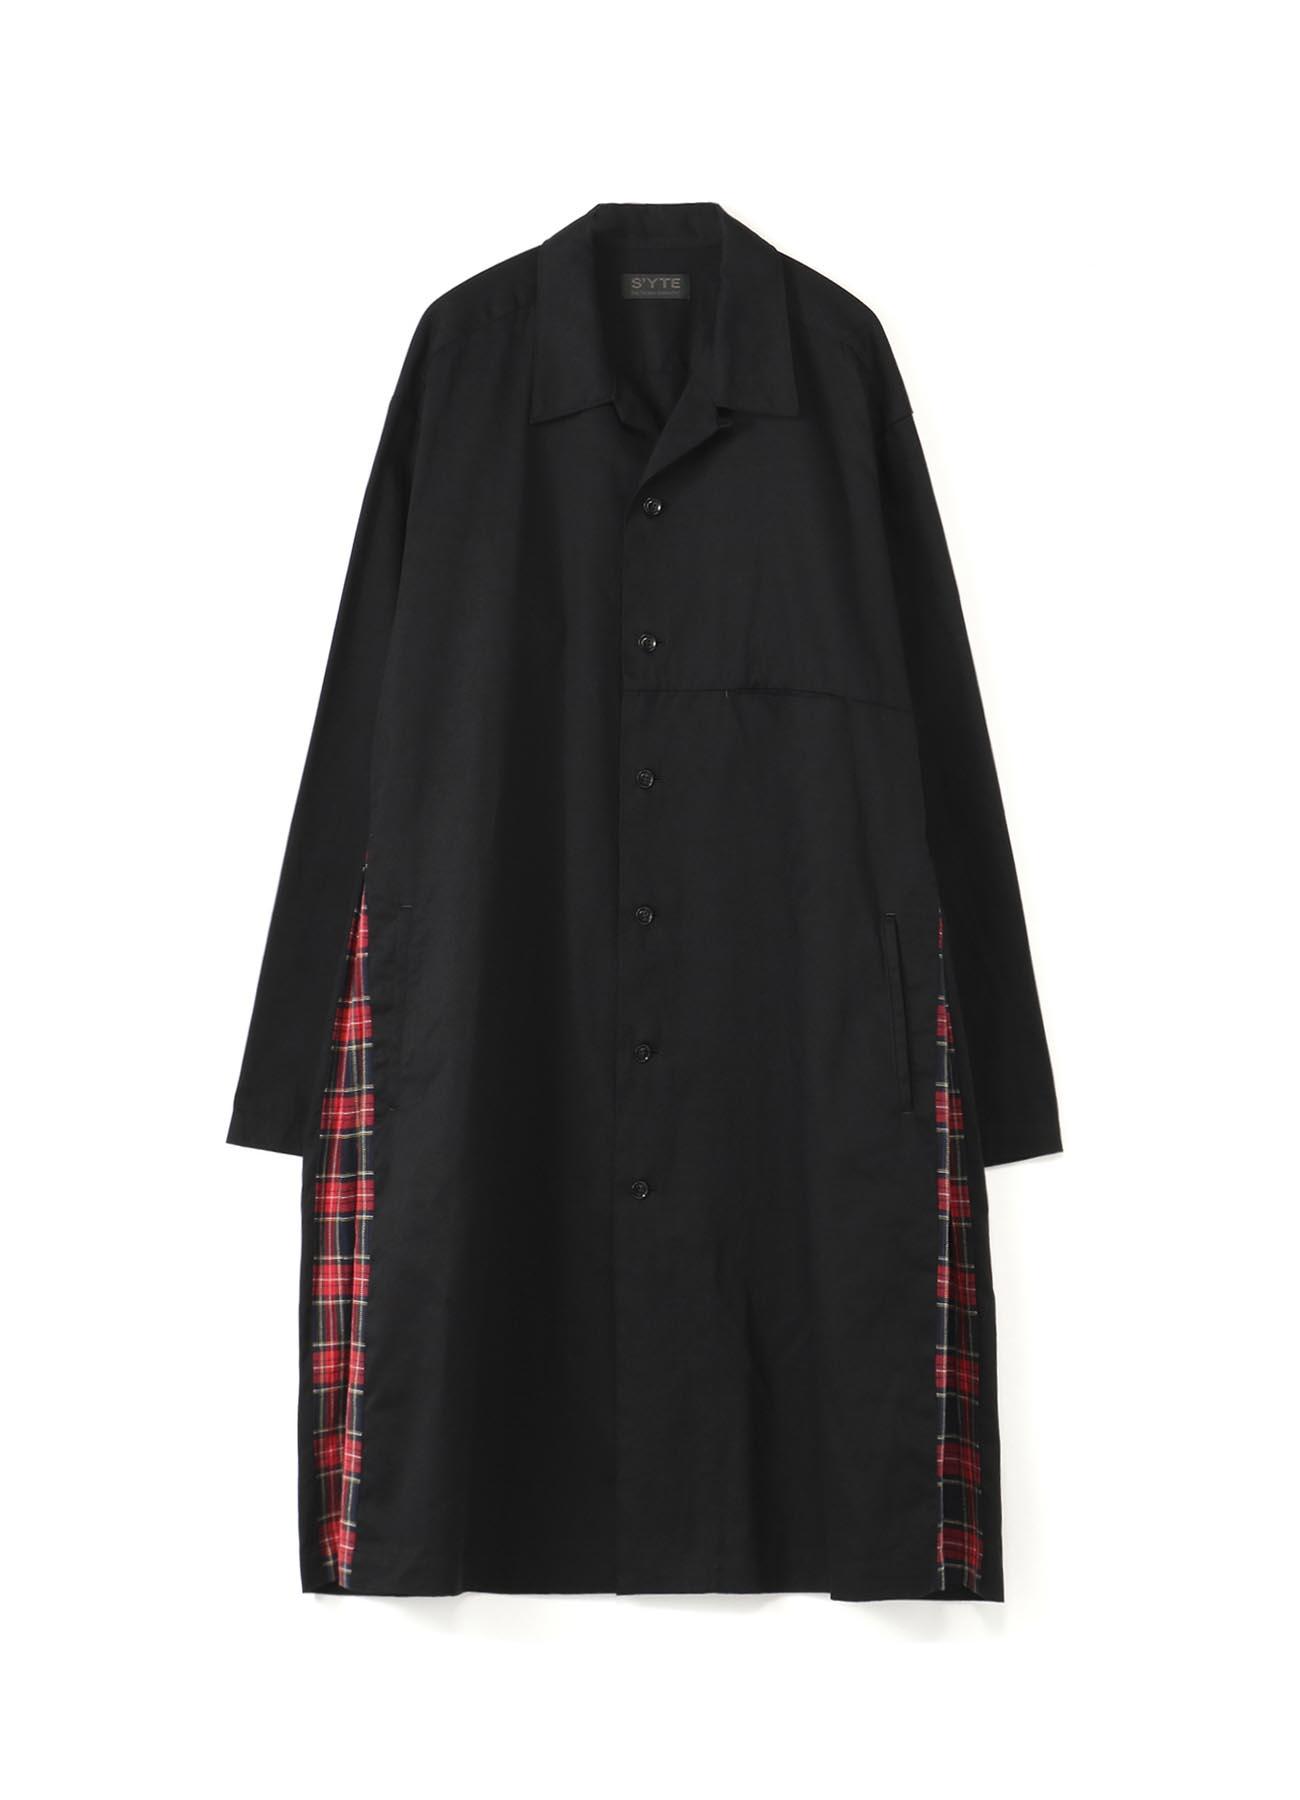 20/Cotton Twill Side Pleated Tartan Check Long Shirt Jacket